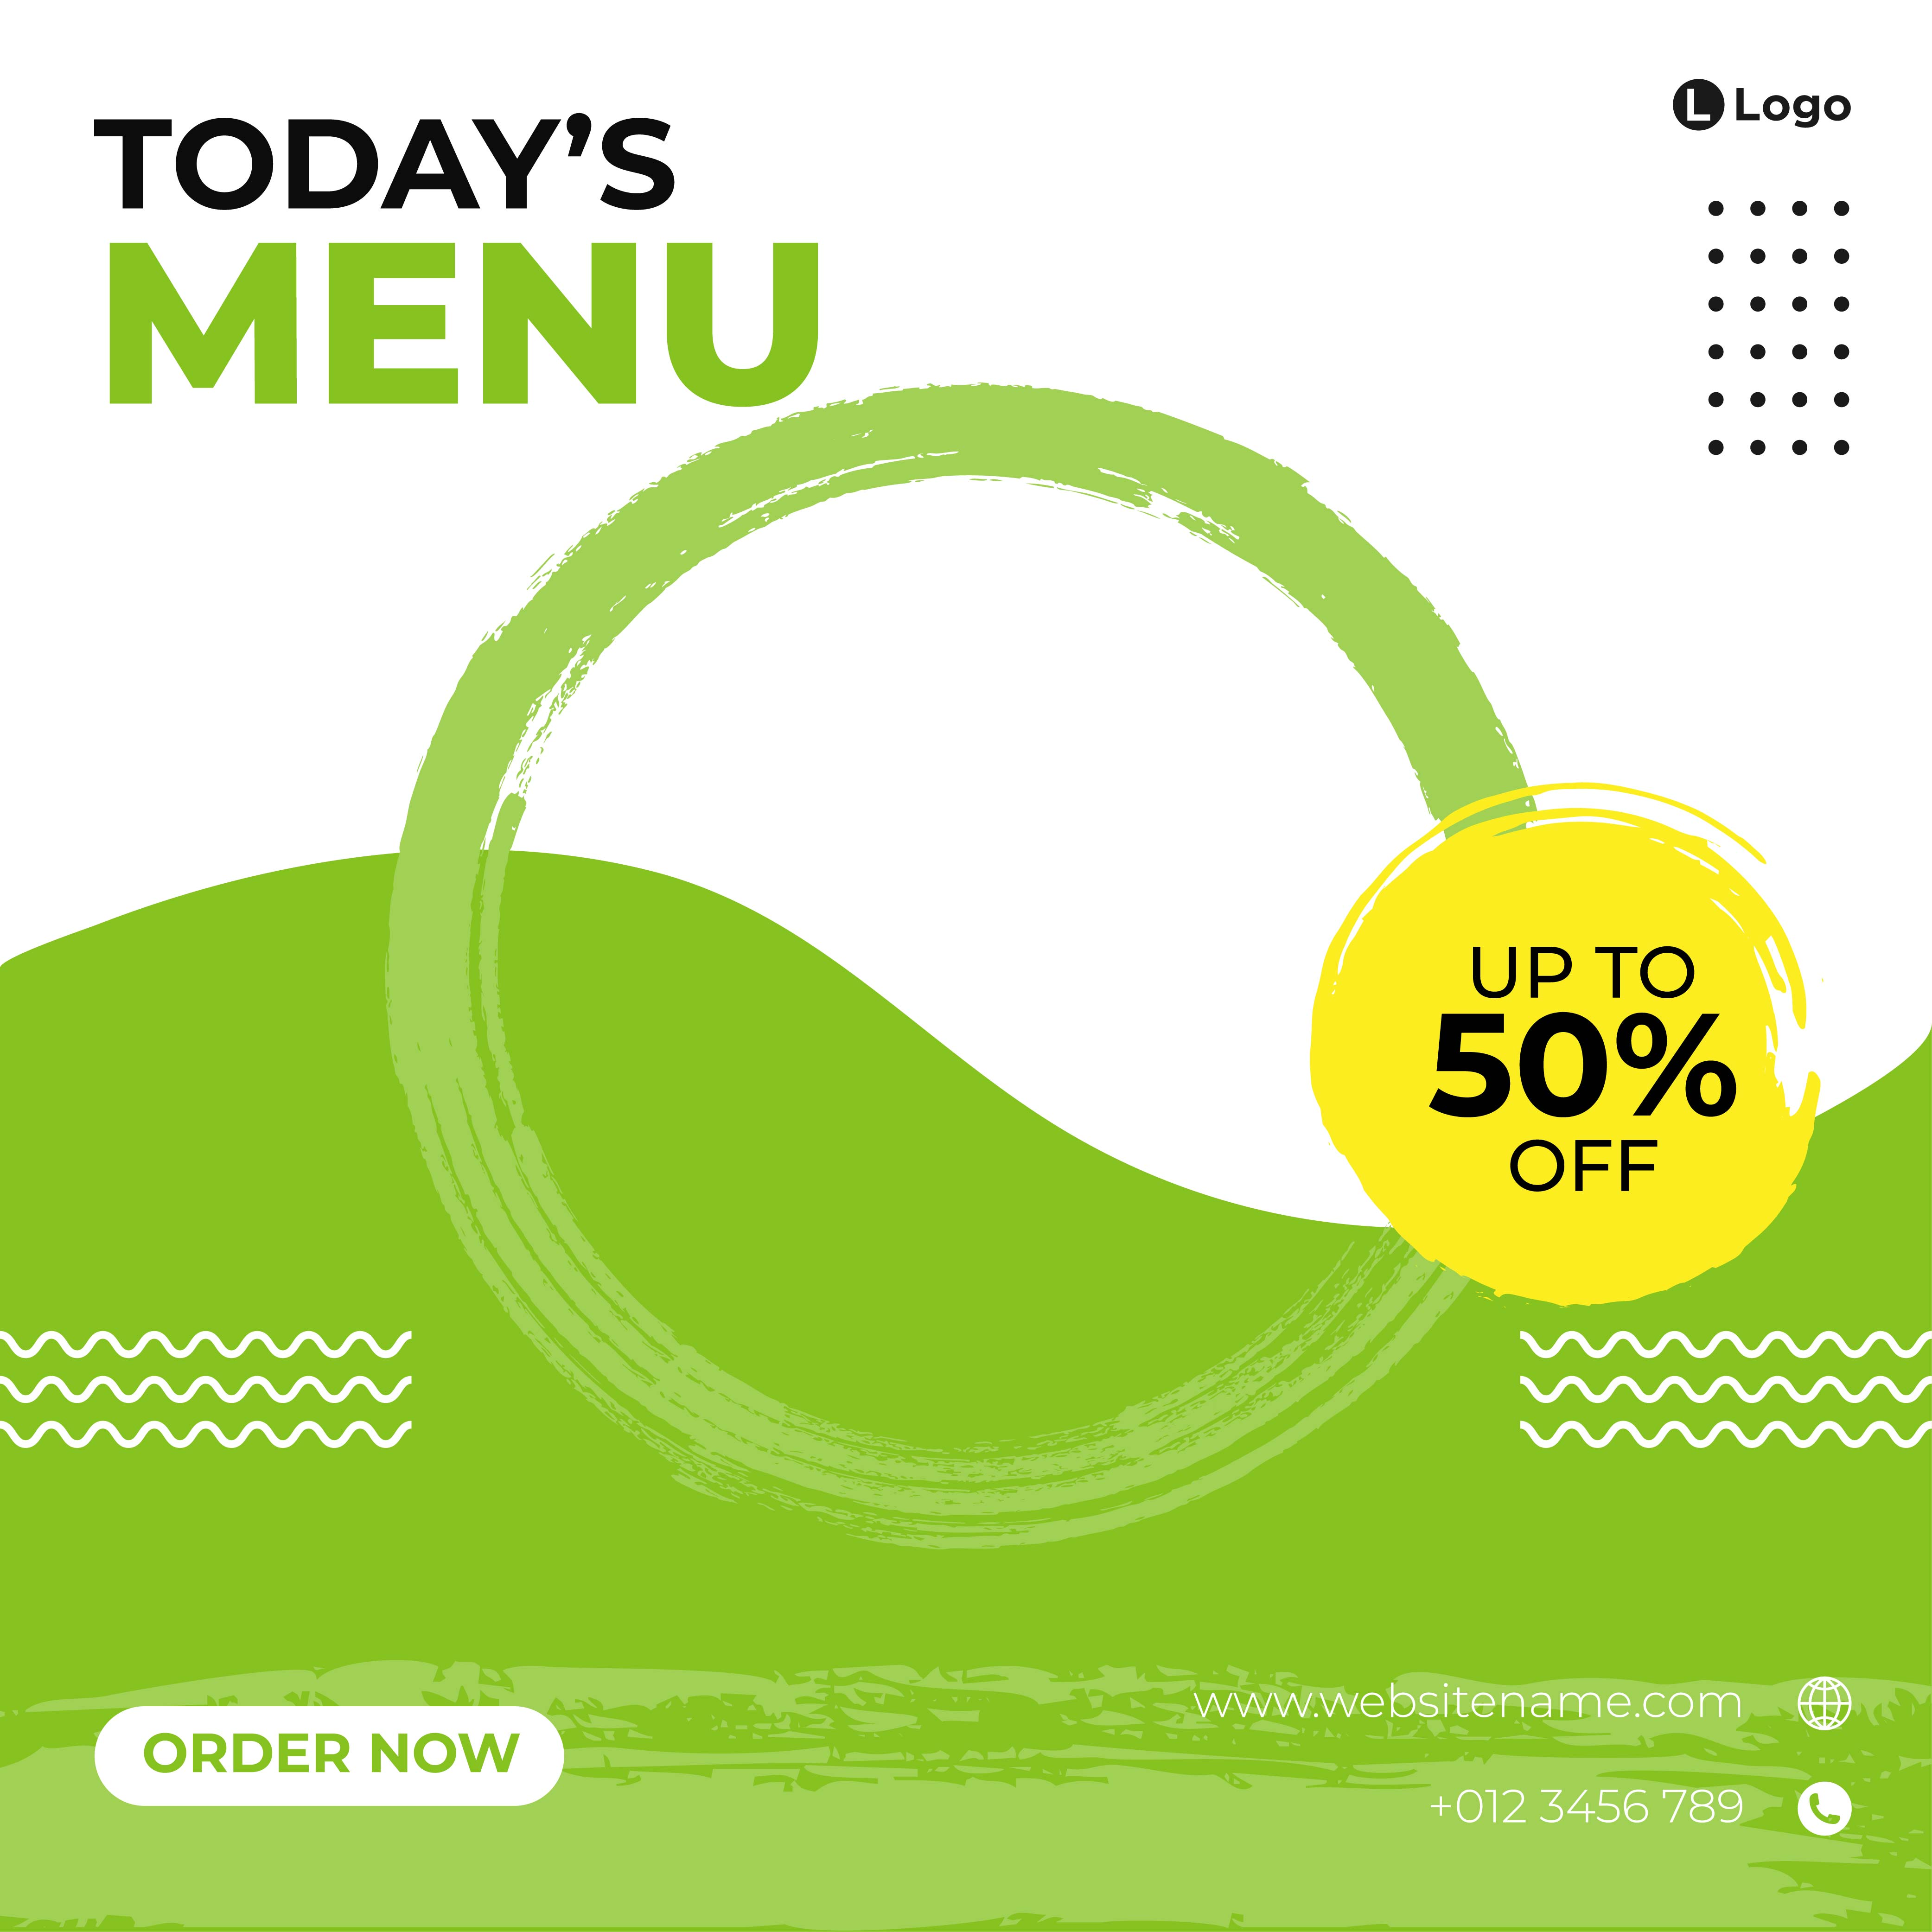 White and green brush stroke food social media template vector